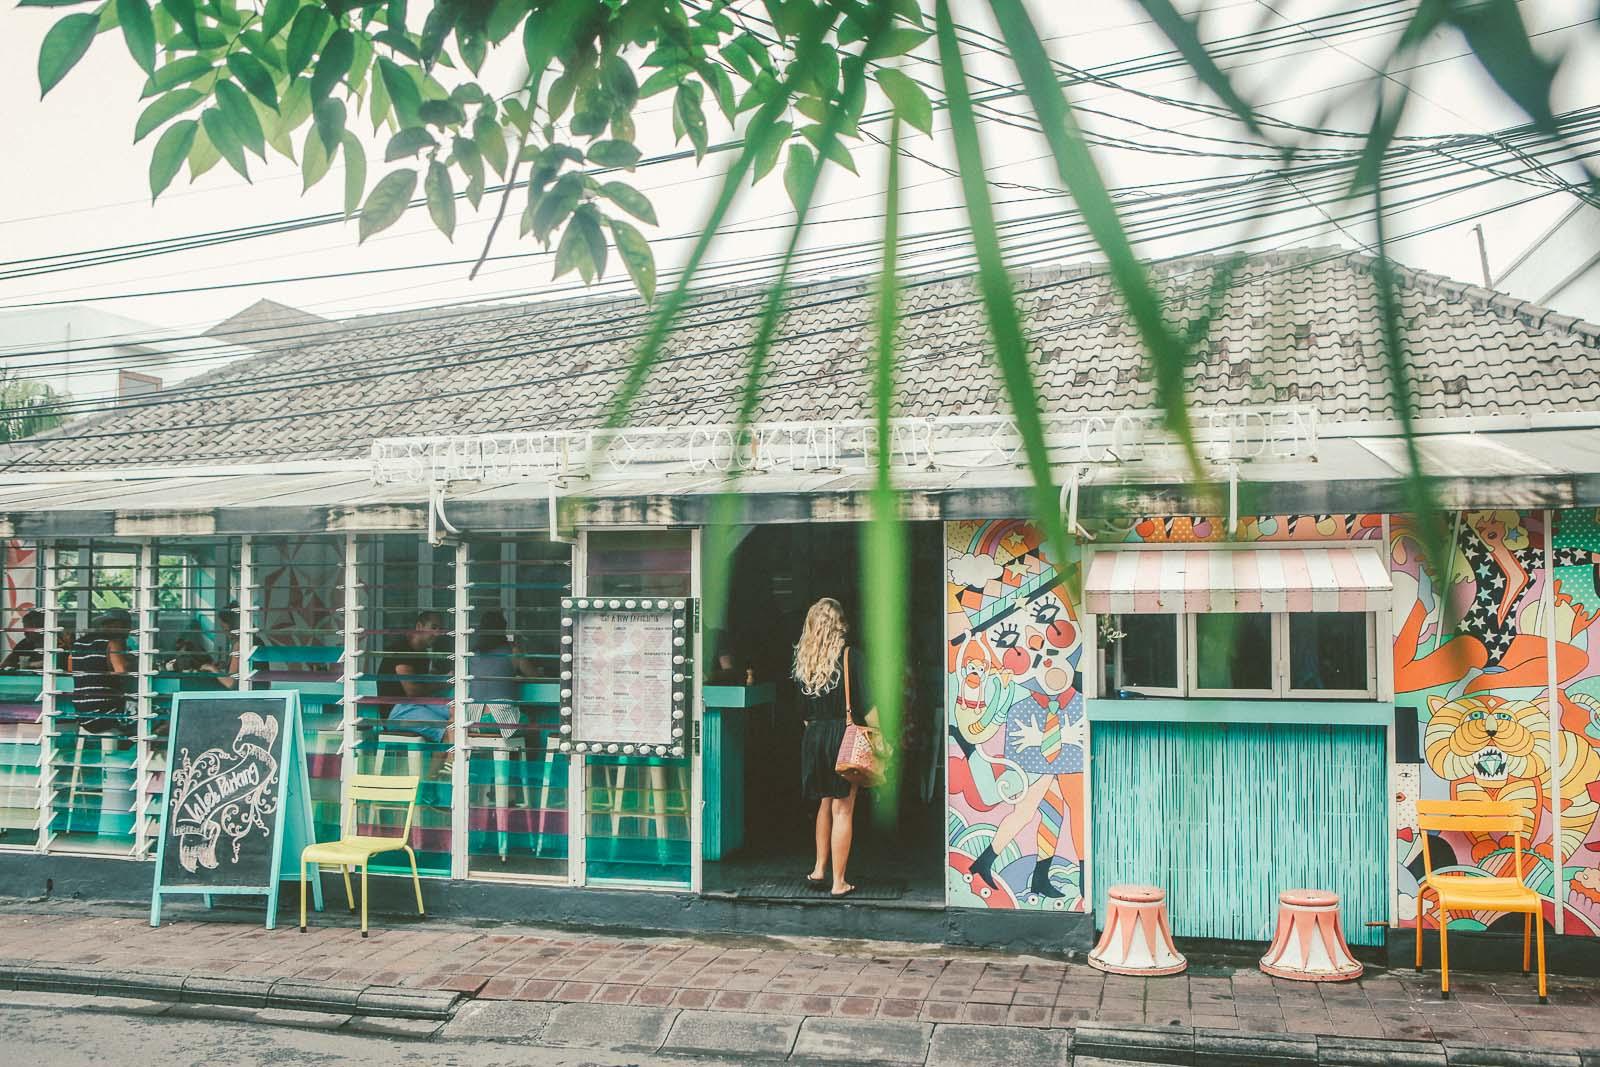 Bali-Travel-Blog-Seminyak-Restaurant-Bar-Breakfast-Surf-Uluwatu-The-Colonial-Hotel-Sea-Circus-2301